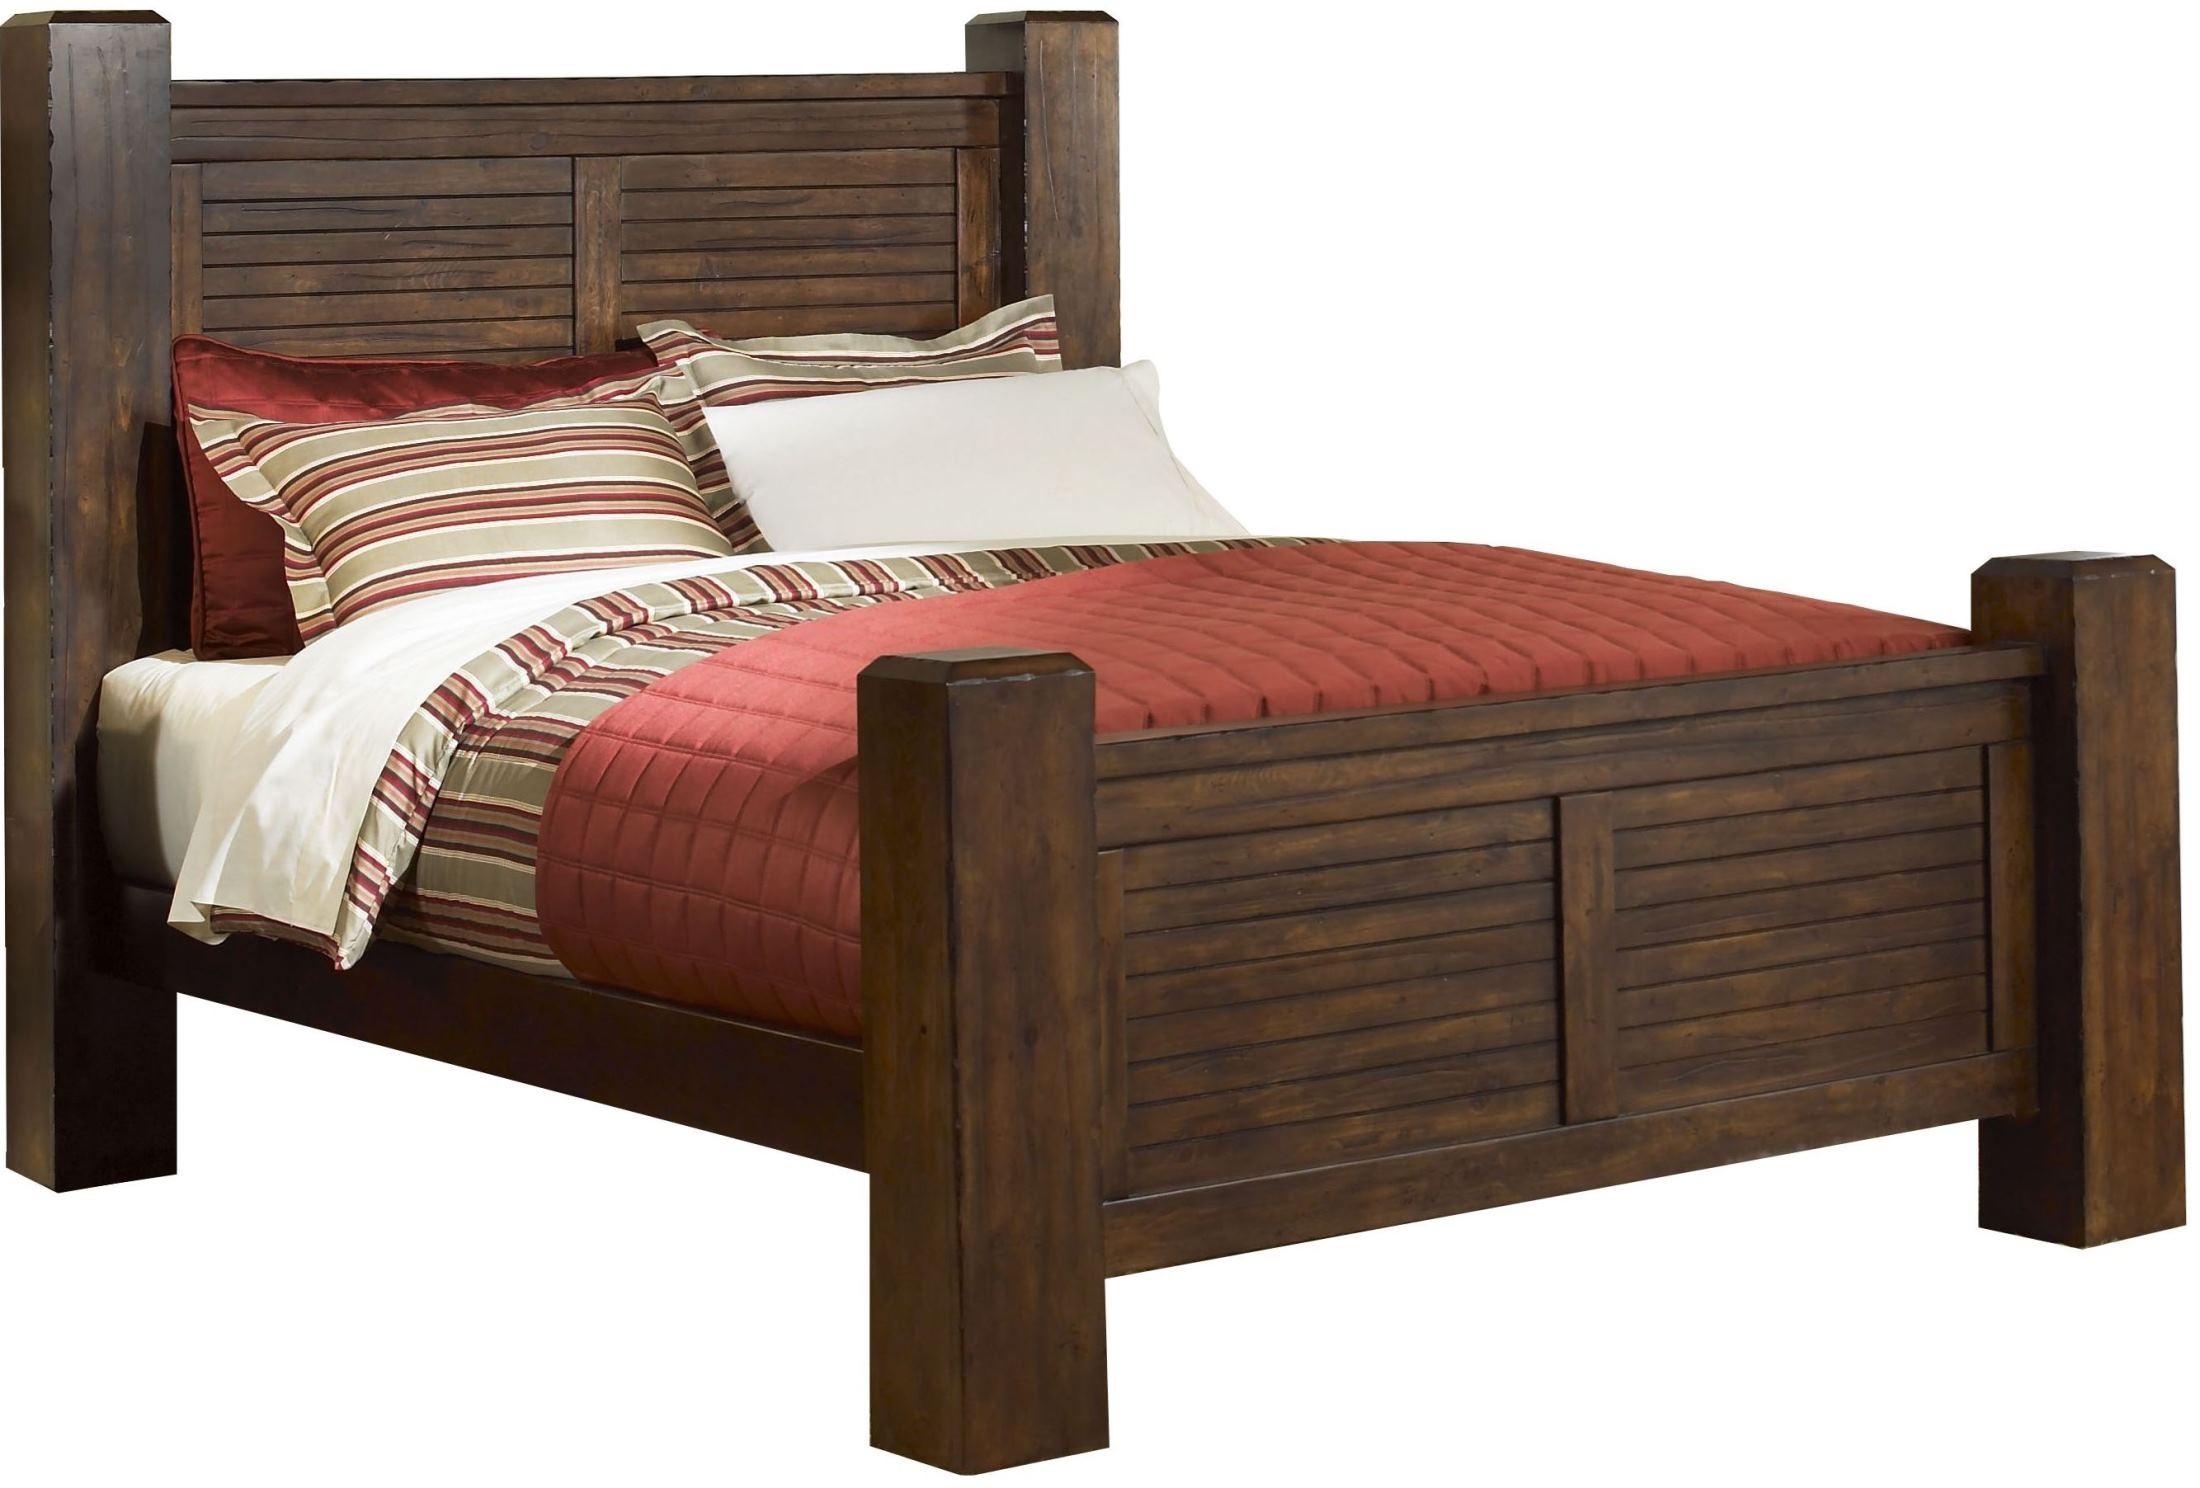 Trestlewood Mesquite Pine King Poster Bed from Progressive Furniture ...